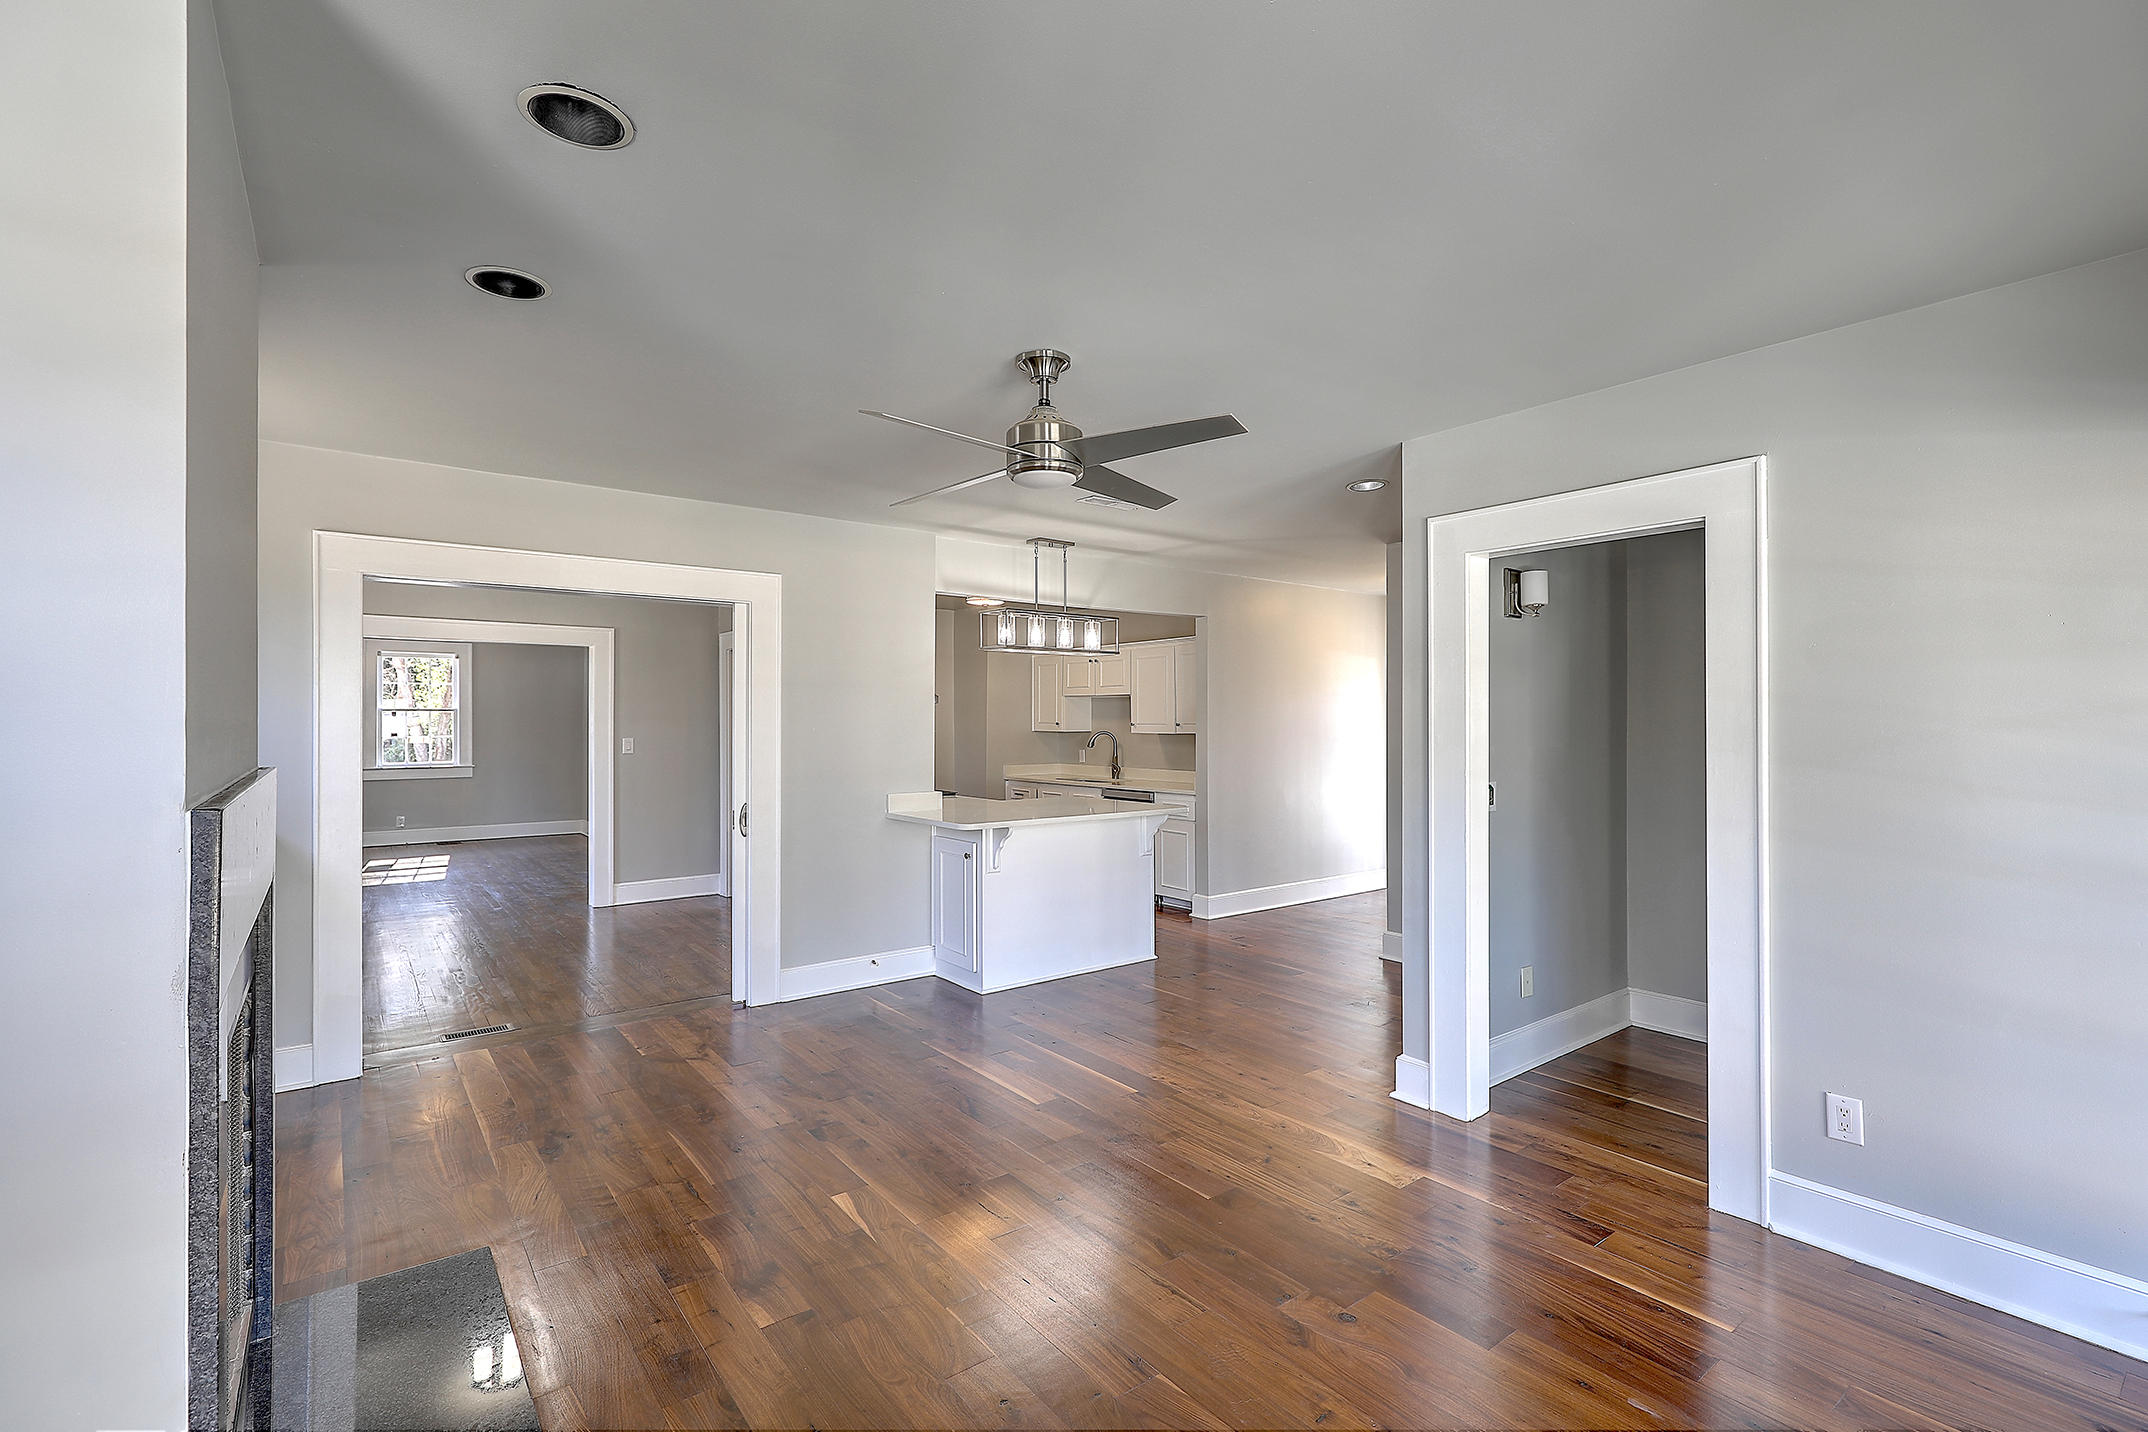 Riverland Terrace Homes For Sale - 2166 St James, Charleston, SC - 0